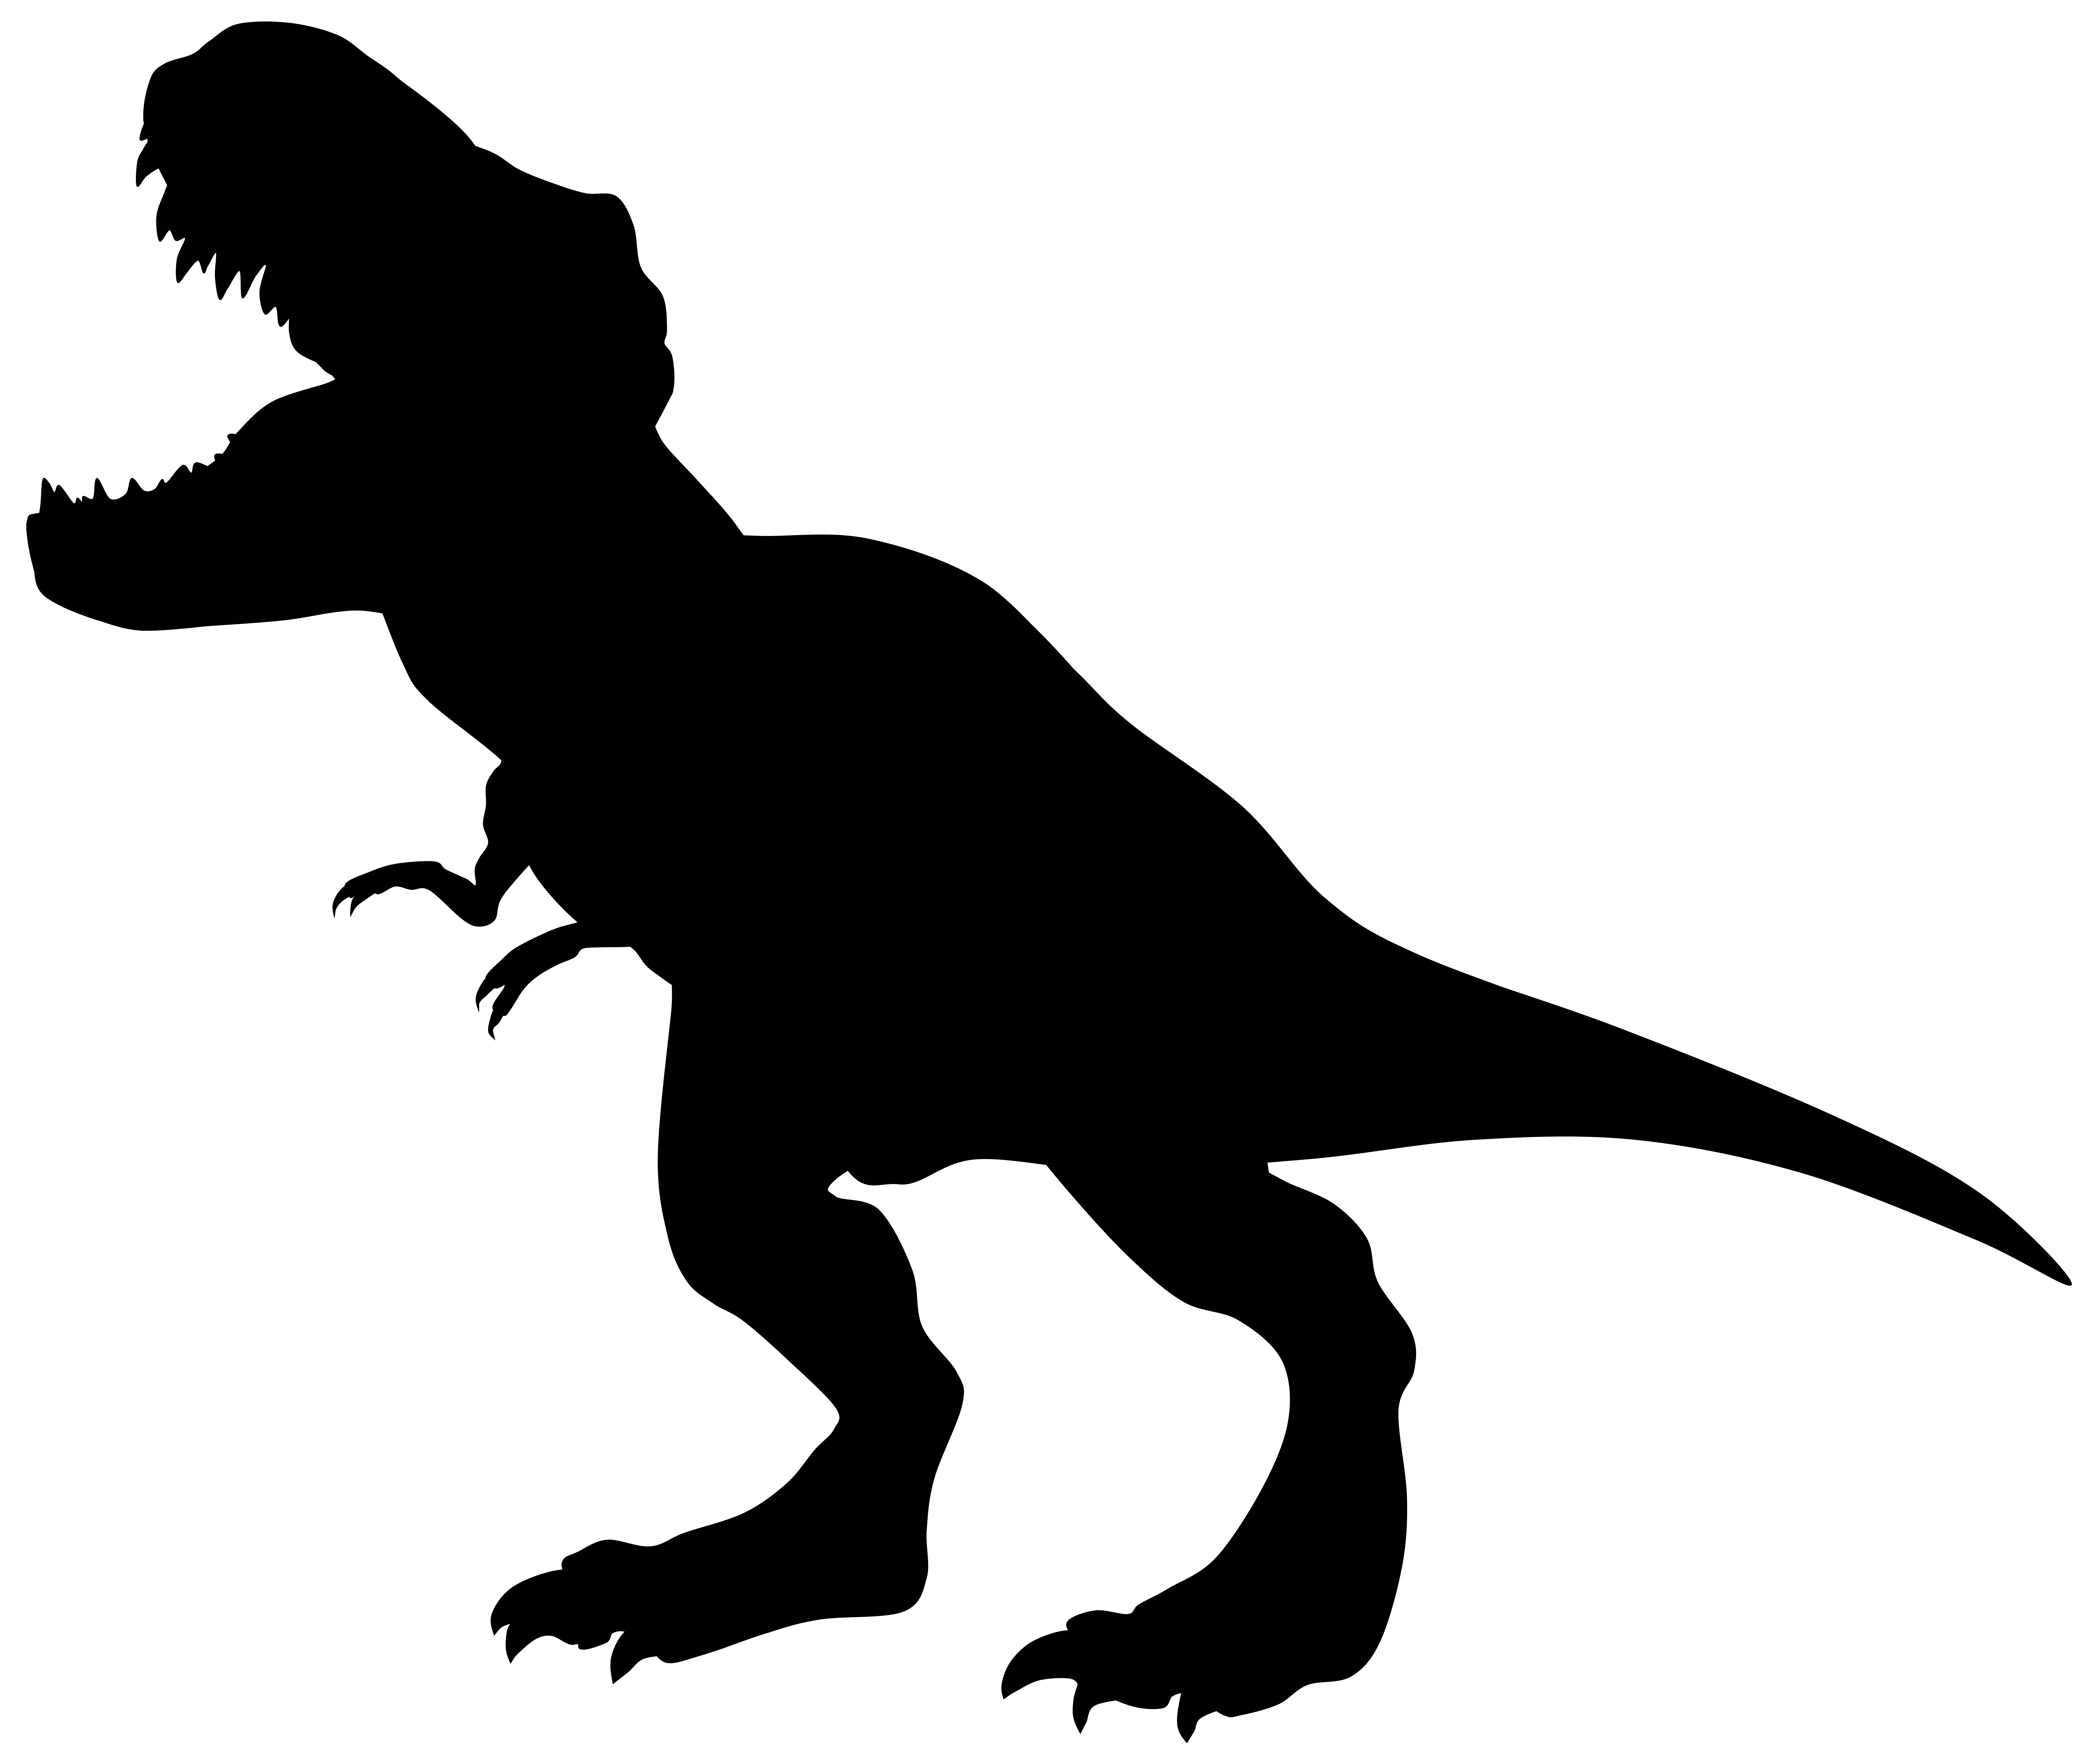 t rex silhouette clip art free at getdrawings com free dino clipart vipkid dino clipart vipkid